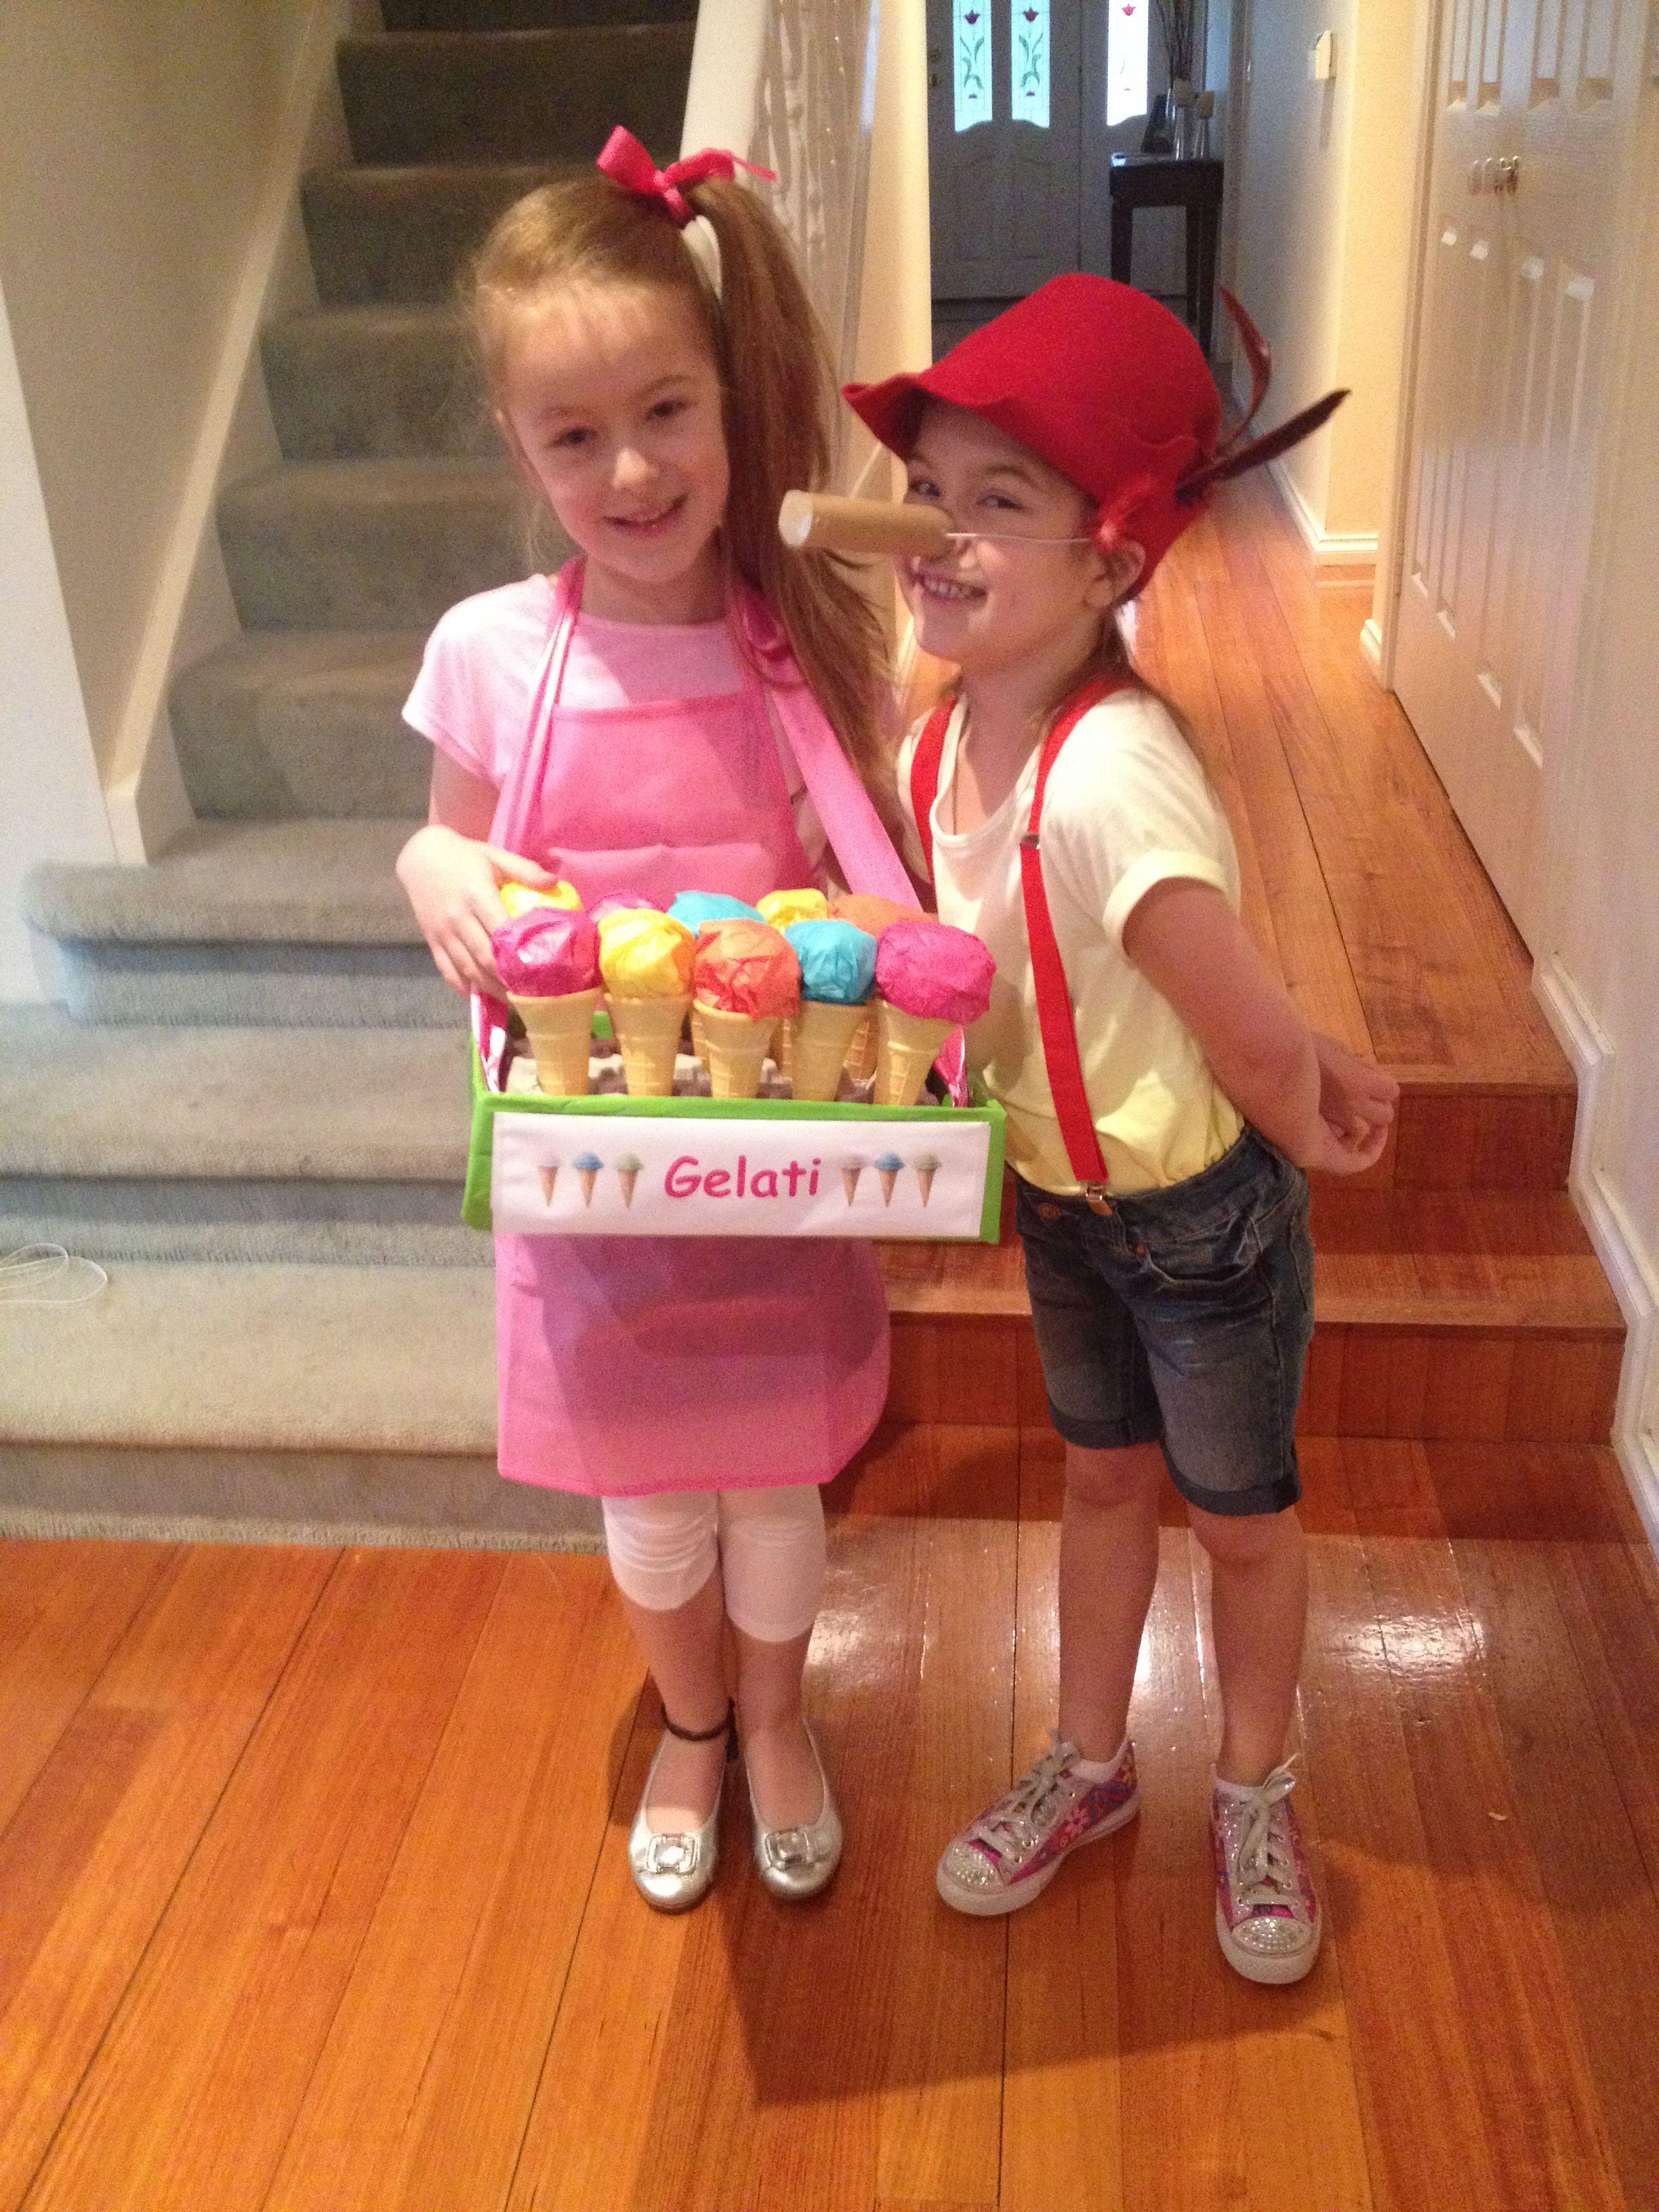 Easy Brilliant Italian Day Costumes Pinocchio Gelati Halloween Costumes For Kids Fancy Dress For Kids Summer Birthday Themes